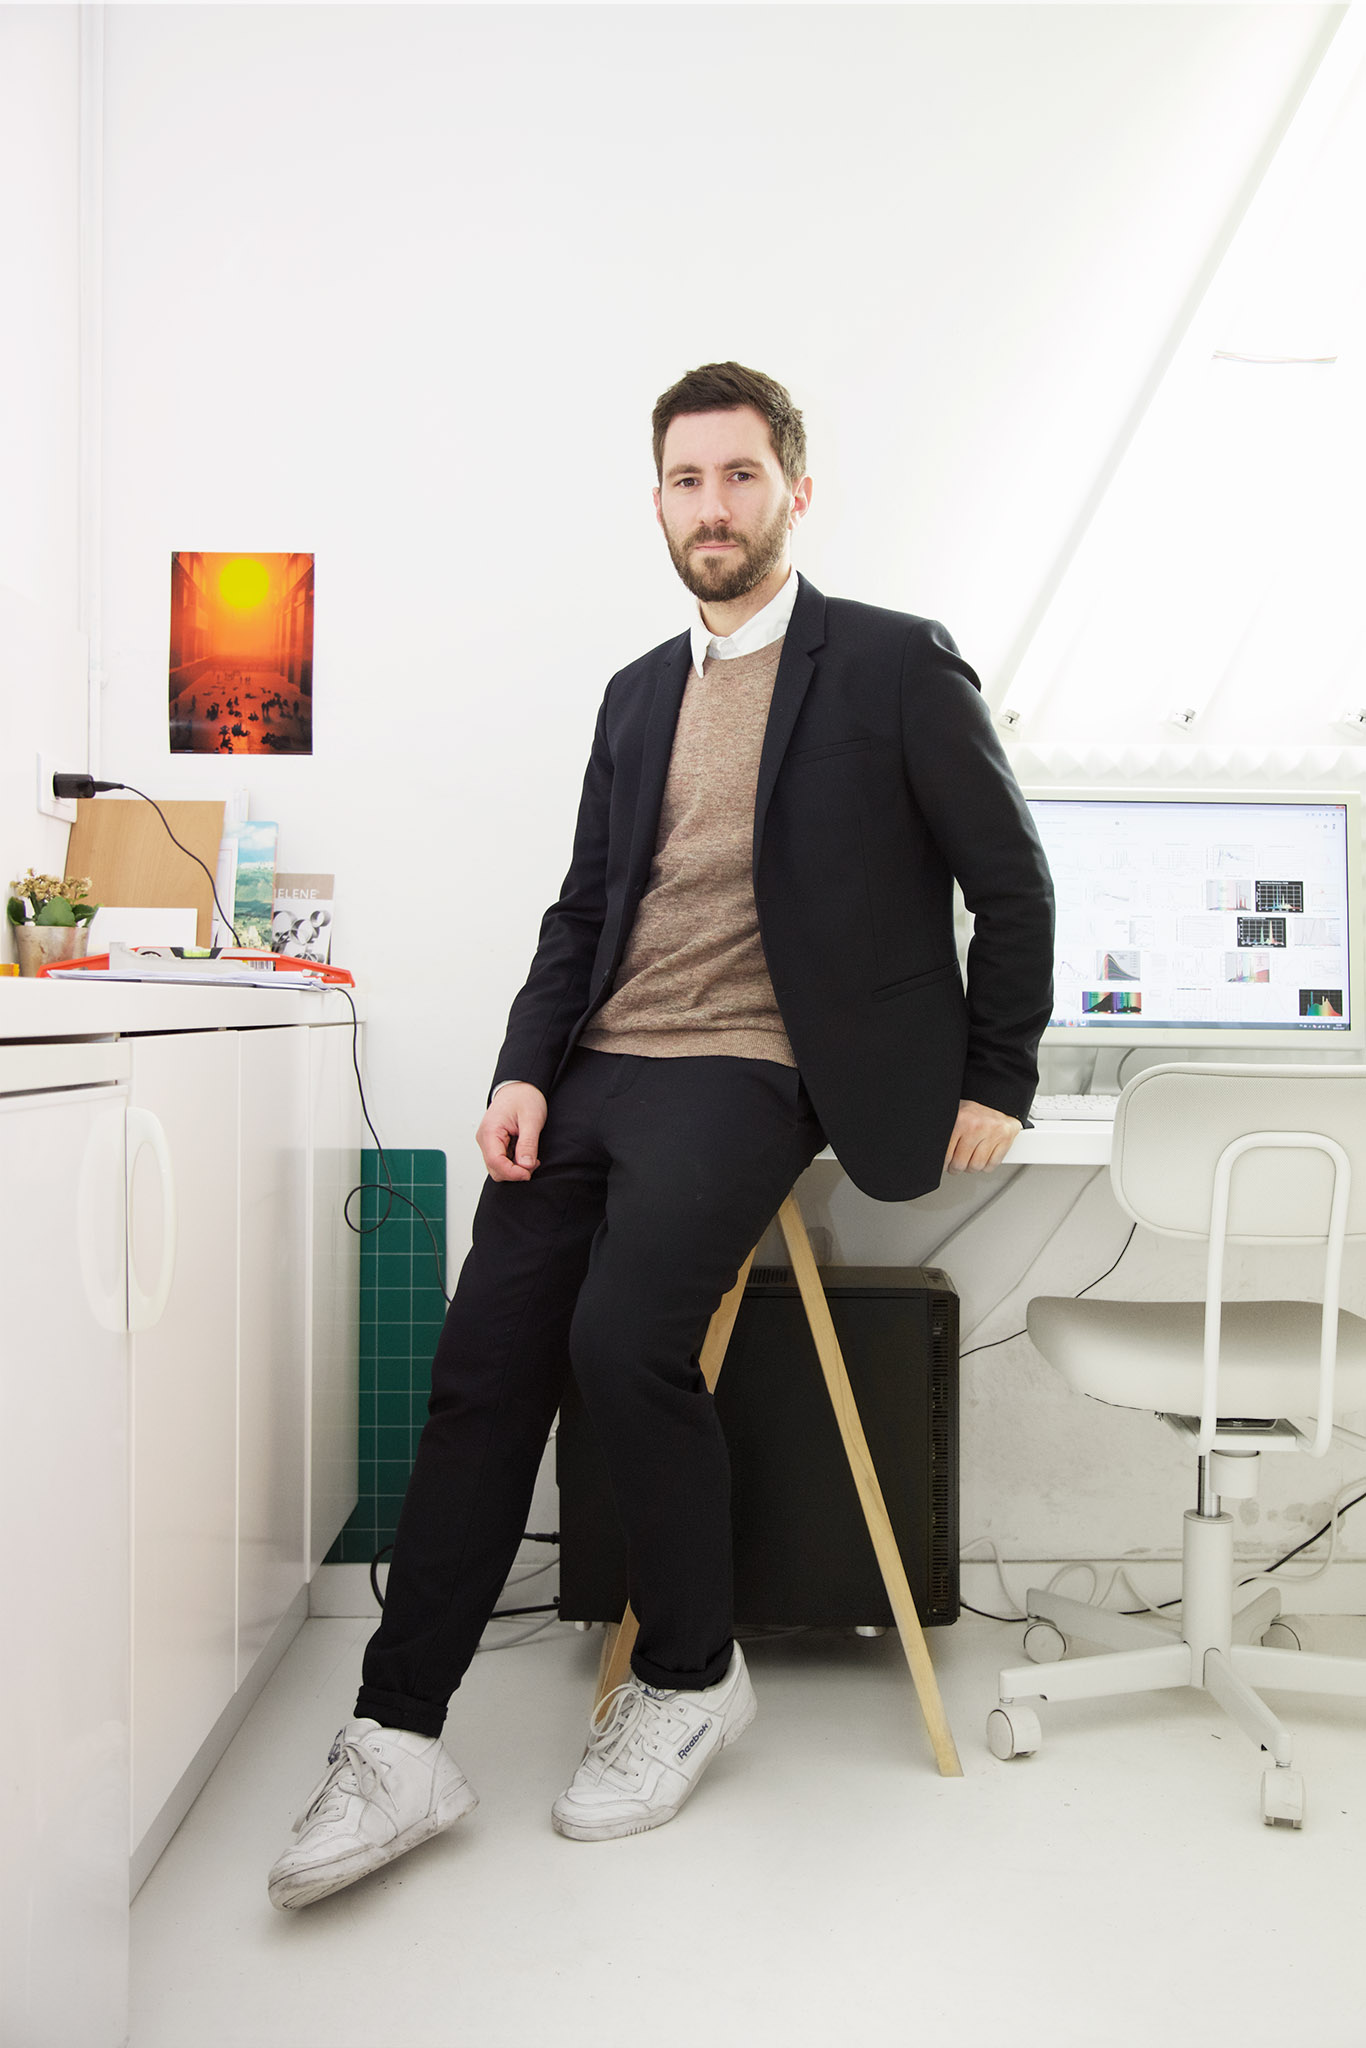 Nicolas Dorval-Bory in his workspace in Paris.